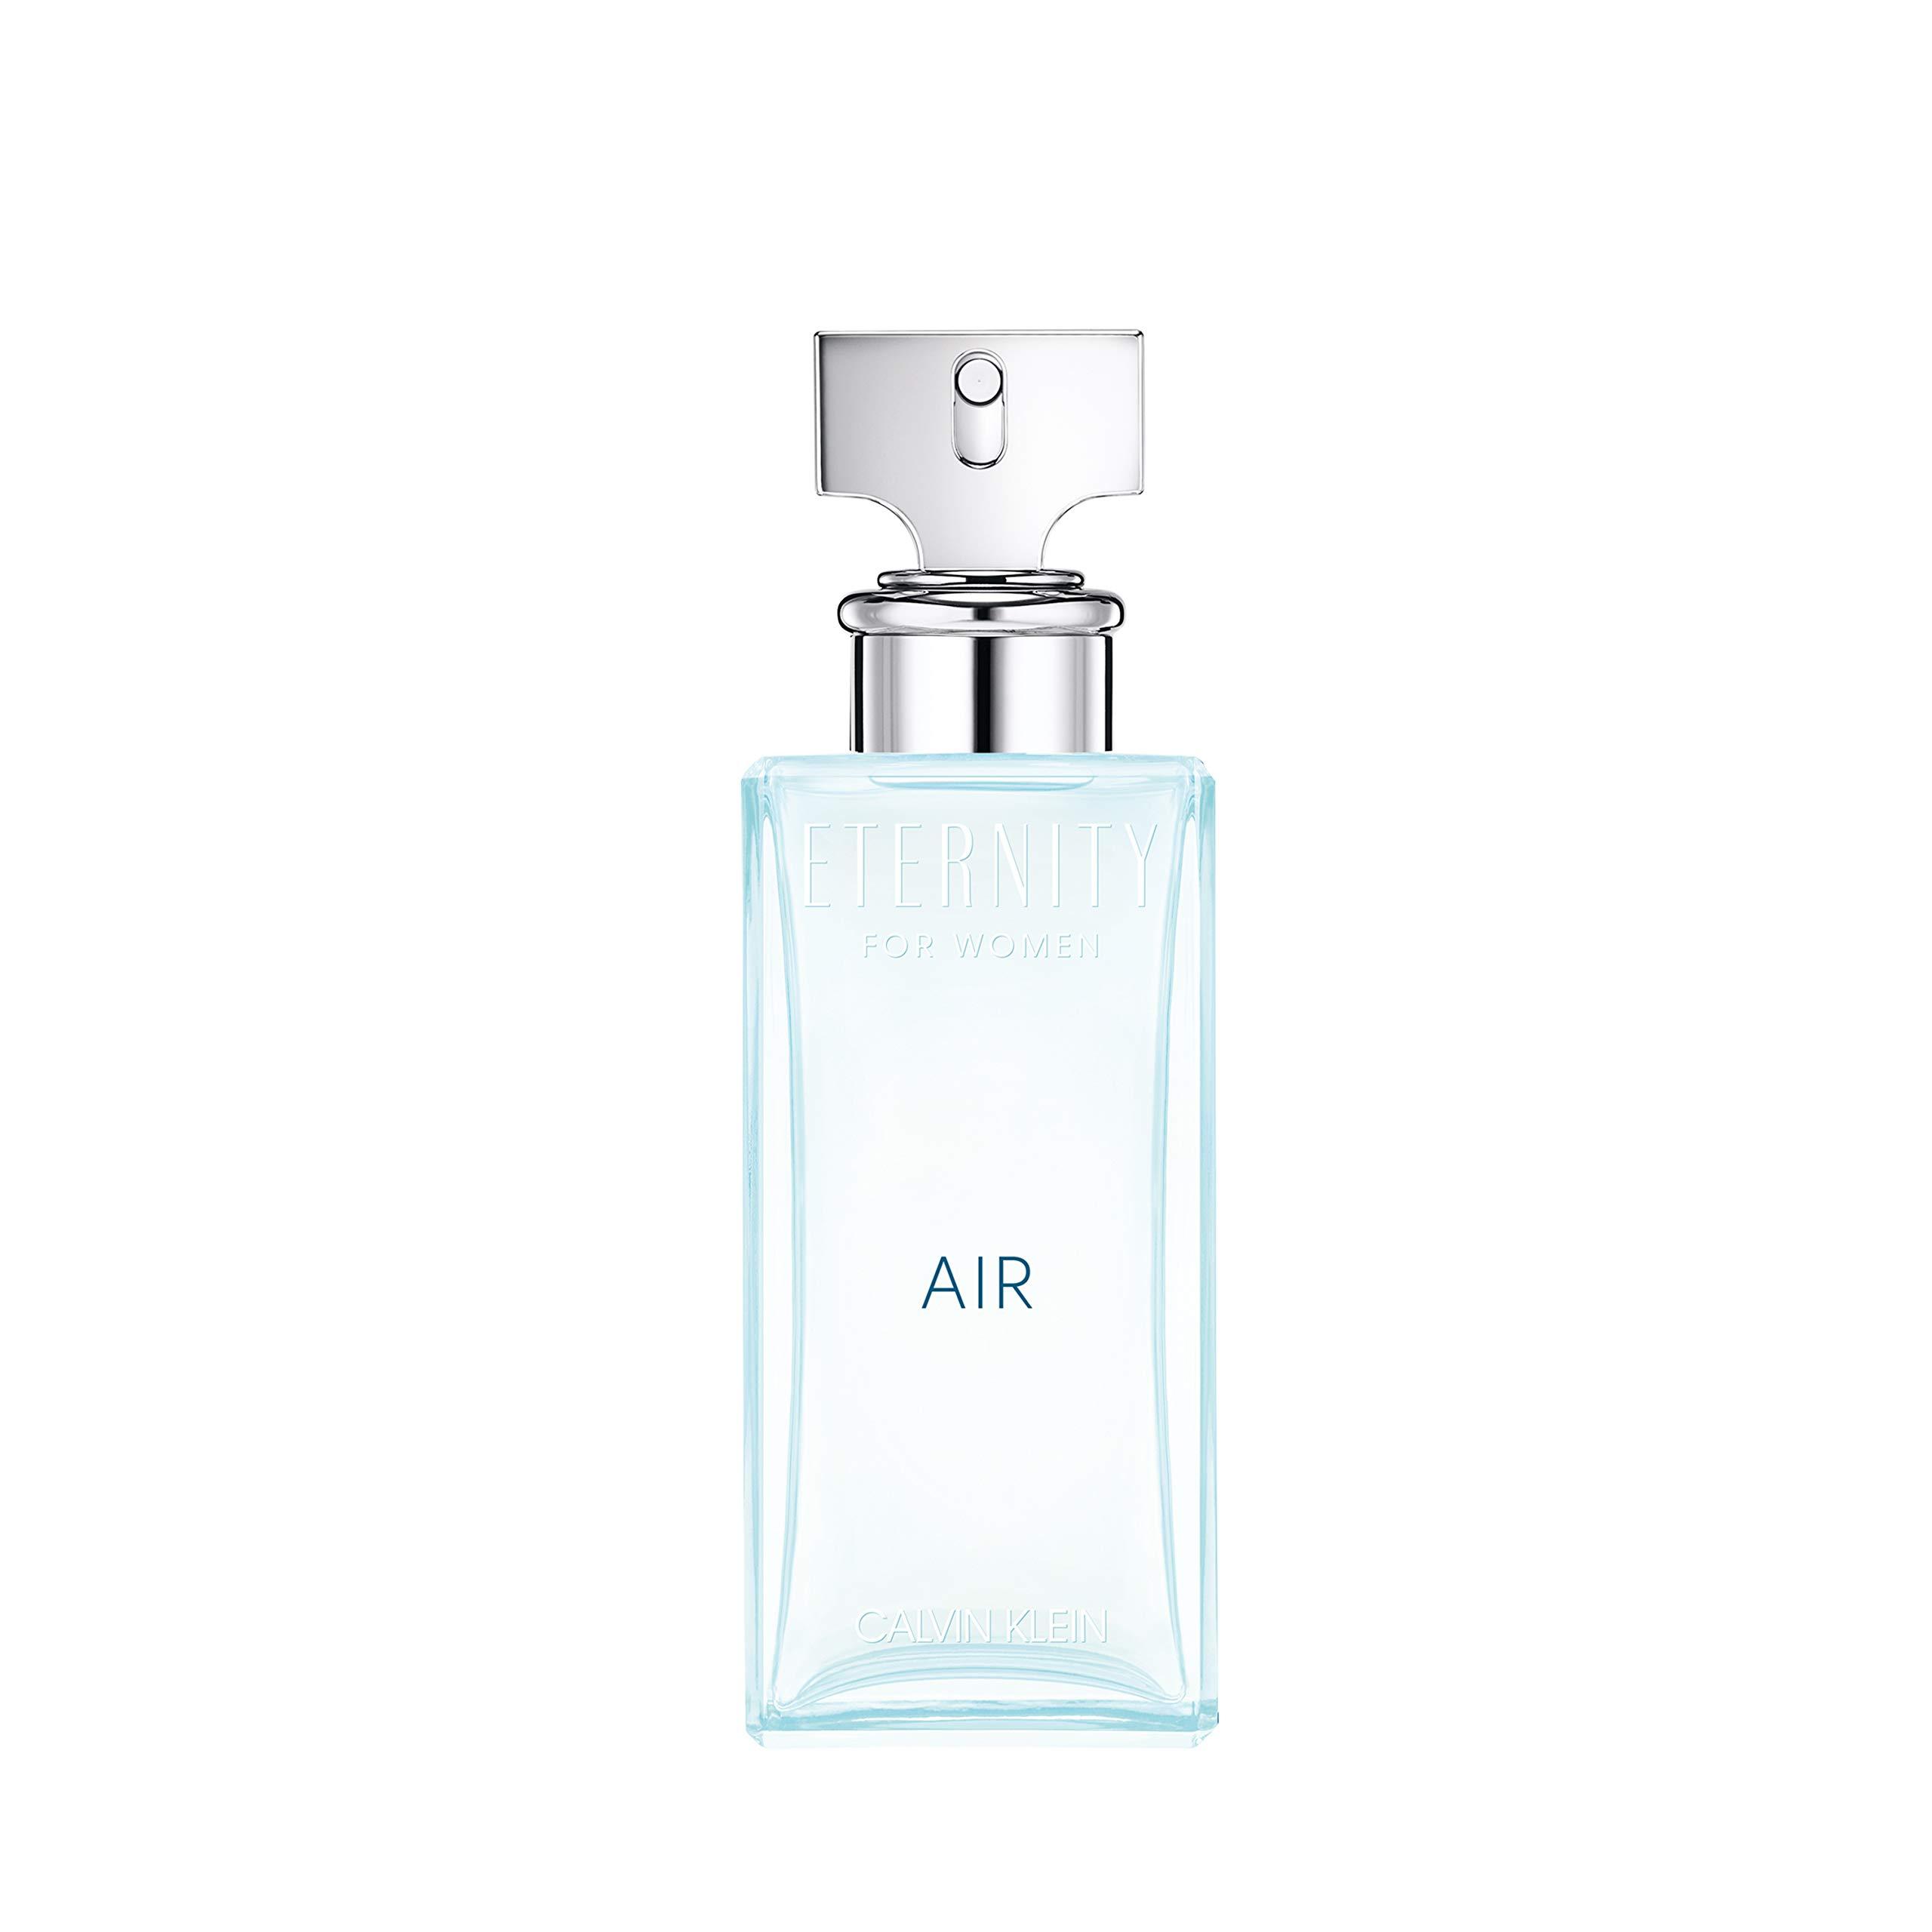 Amazon.com  Calvin Klein Eternity Air Eau De Parfum, 3.4 fl. oz.  CALVIN  KLEIN  Luxury Beauty 2faec8194e